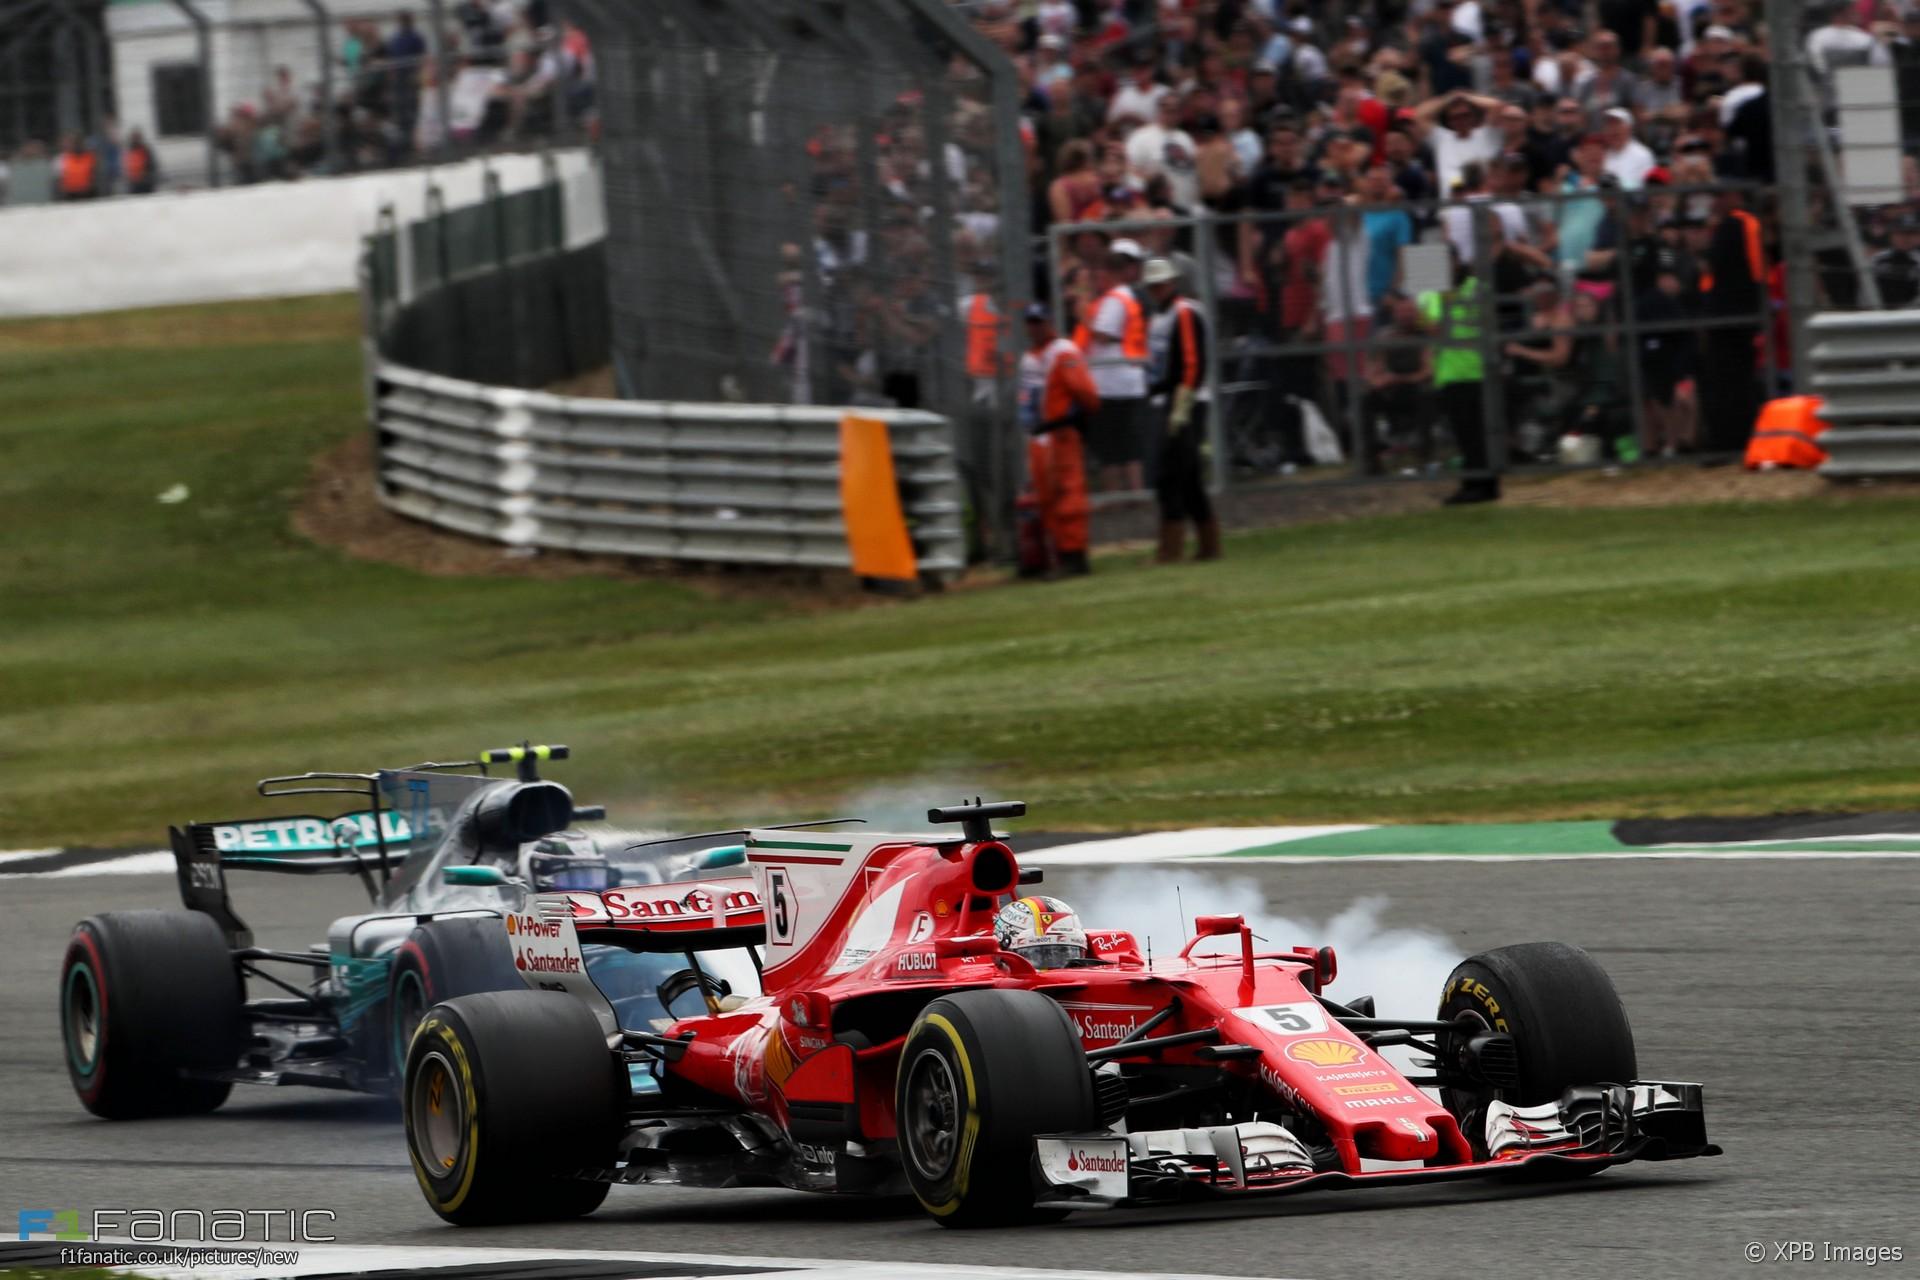 Sebastian Vettel, Valtteri Bottas, Silverstone, 2017